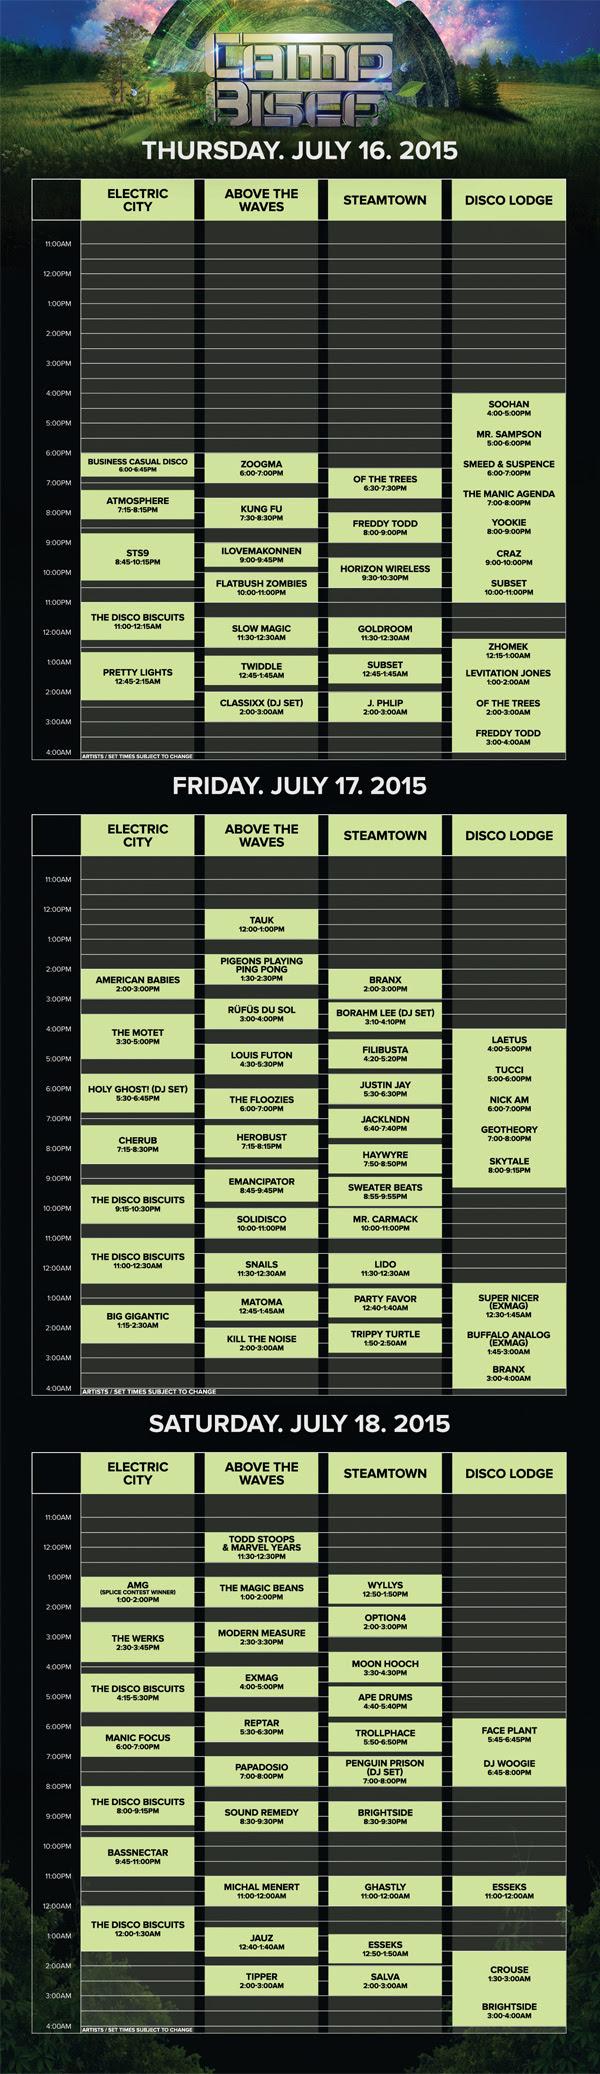 Camp Bisco - Schedule 2015